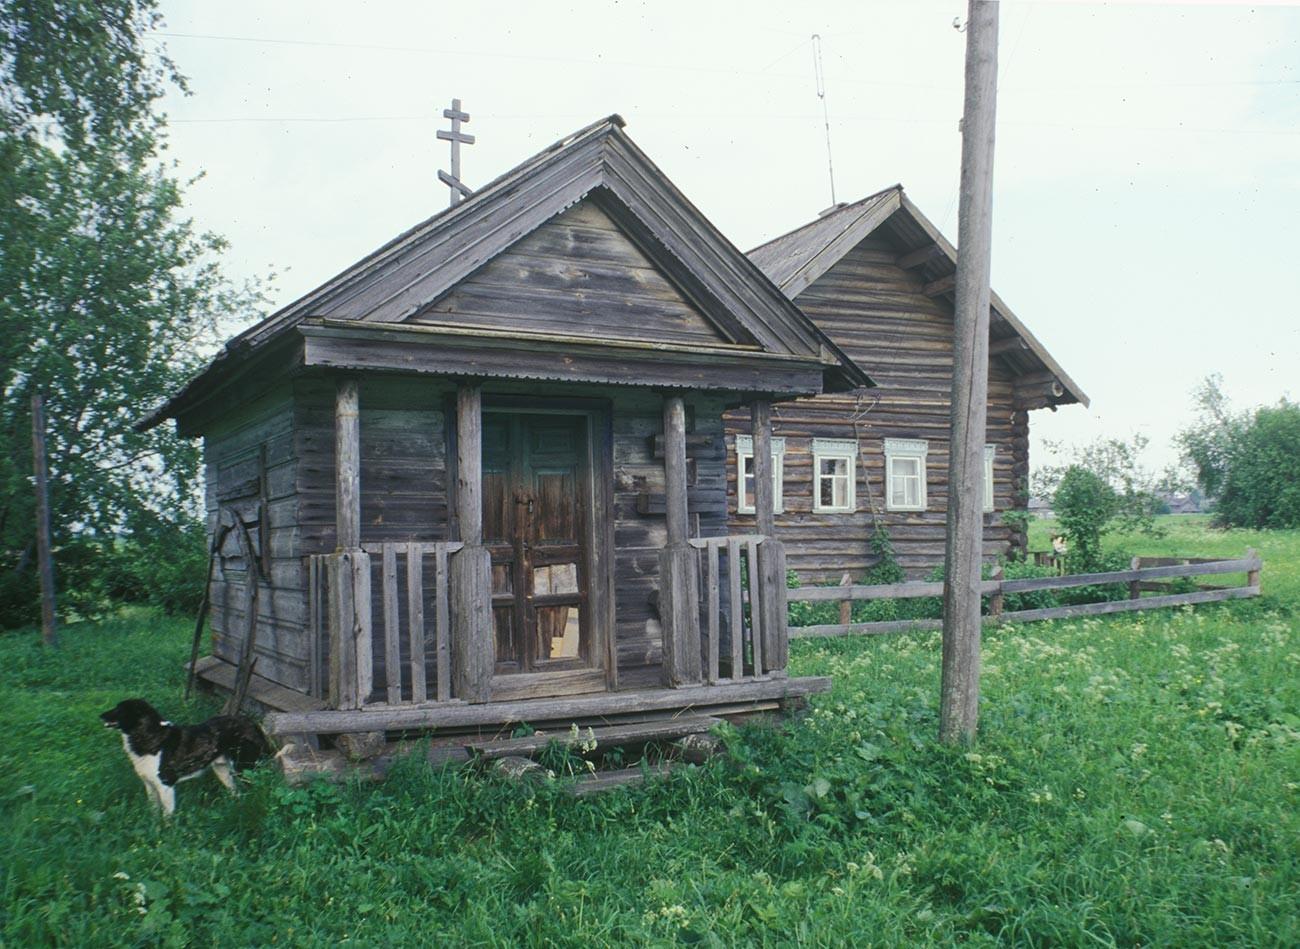 Fominskaja. Kapela čudežne ikone Odrešenika. 16. junij 1998